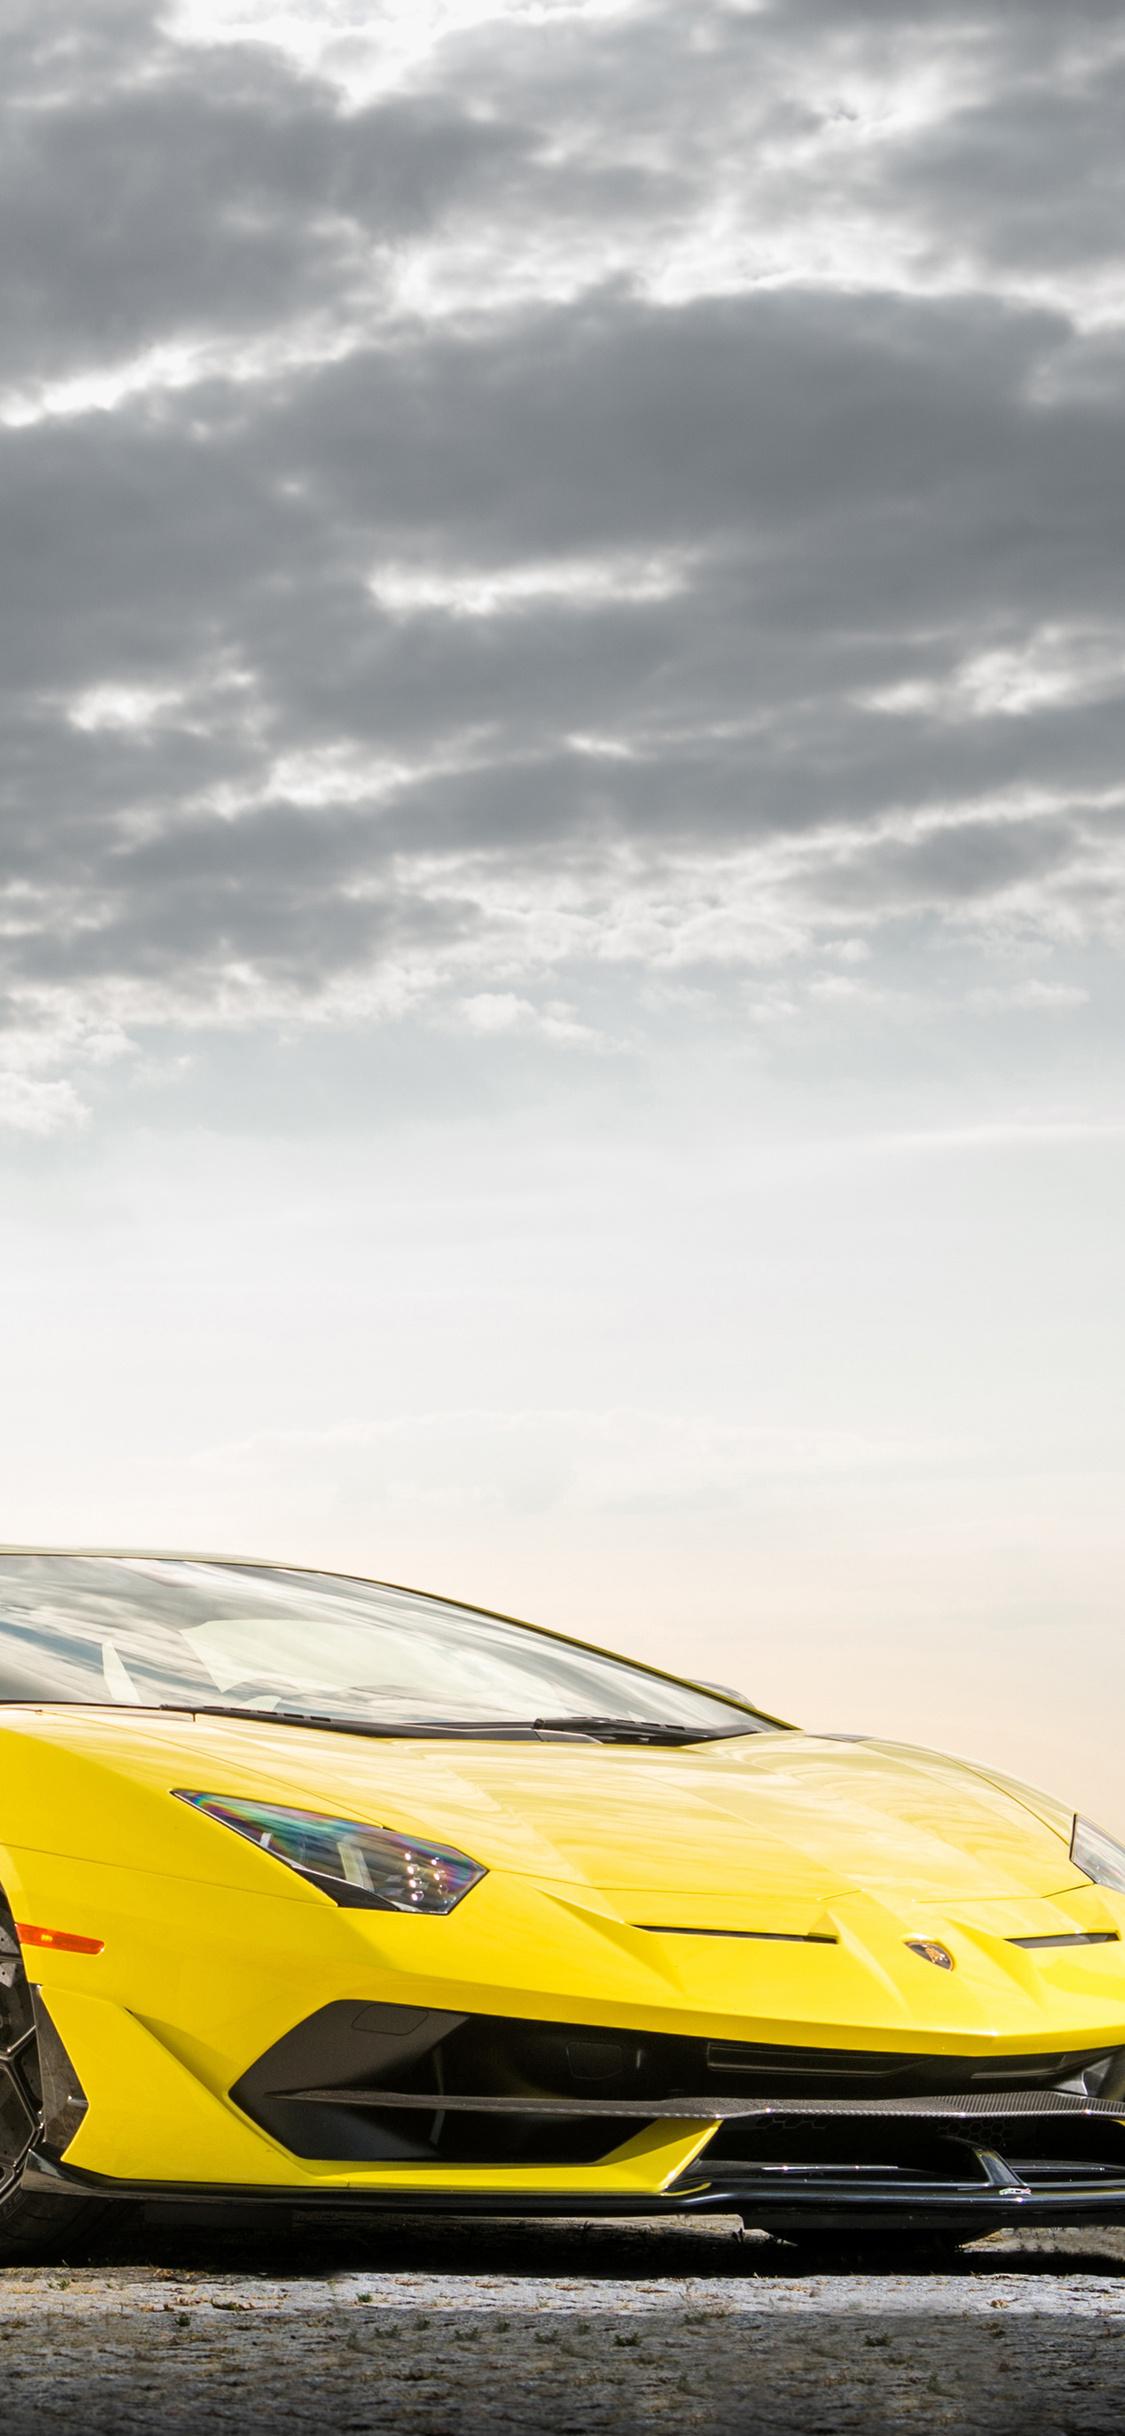 1125x2436 2019 Lamborghini Aventador Svj Front Iphone Xs